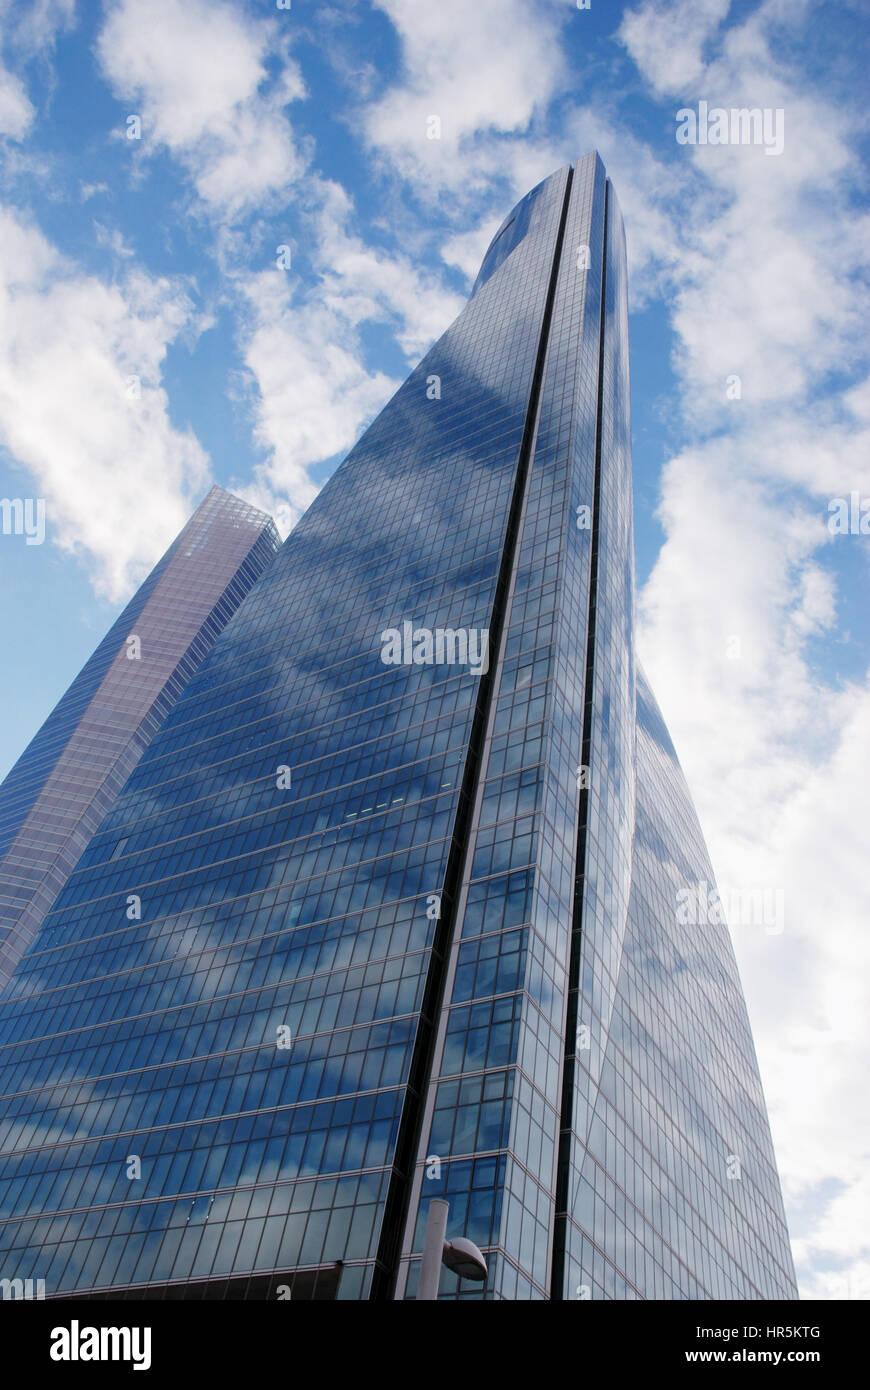 Espacio tower, view from below. CTBA, Madrid, Spain. - Stock Image